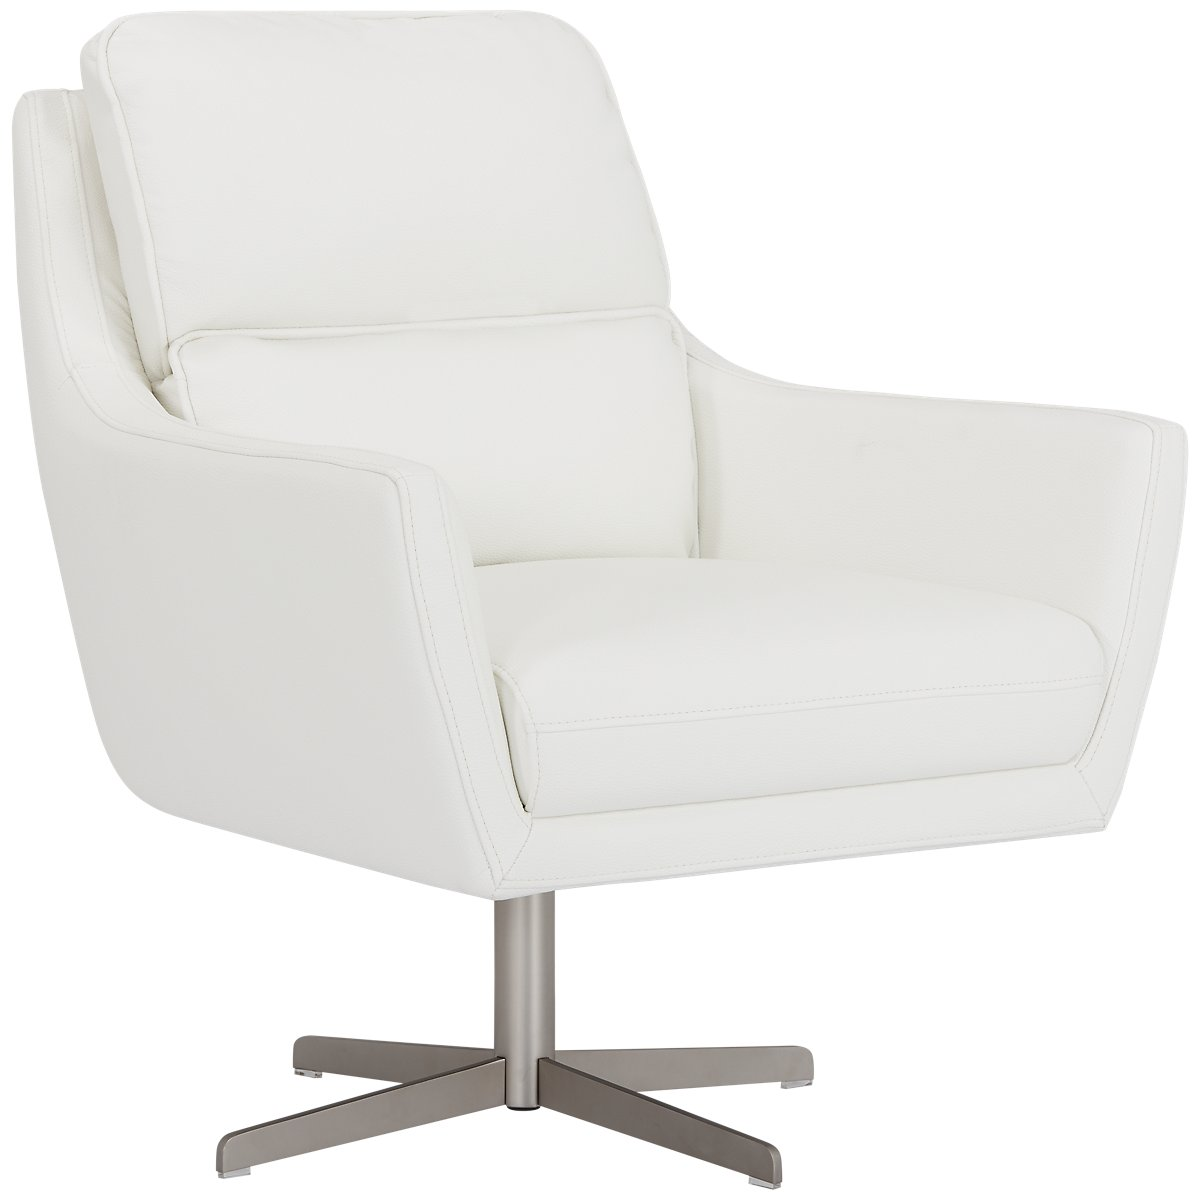 City Furniture Francisco White Microfiber Swivel Accent Chair